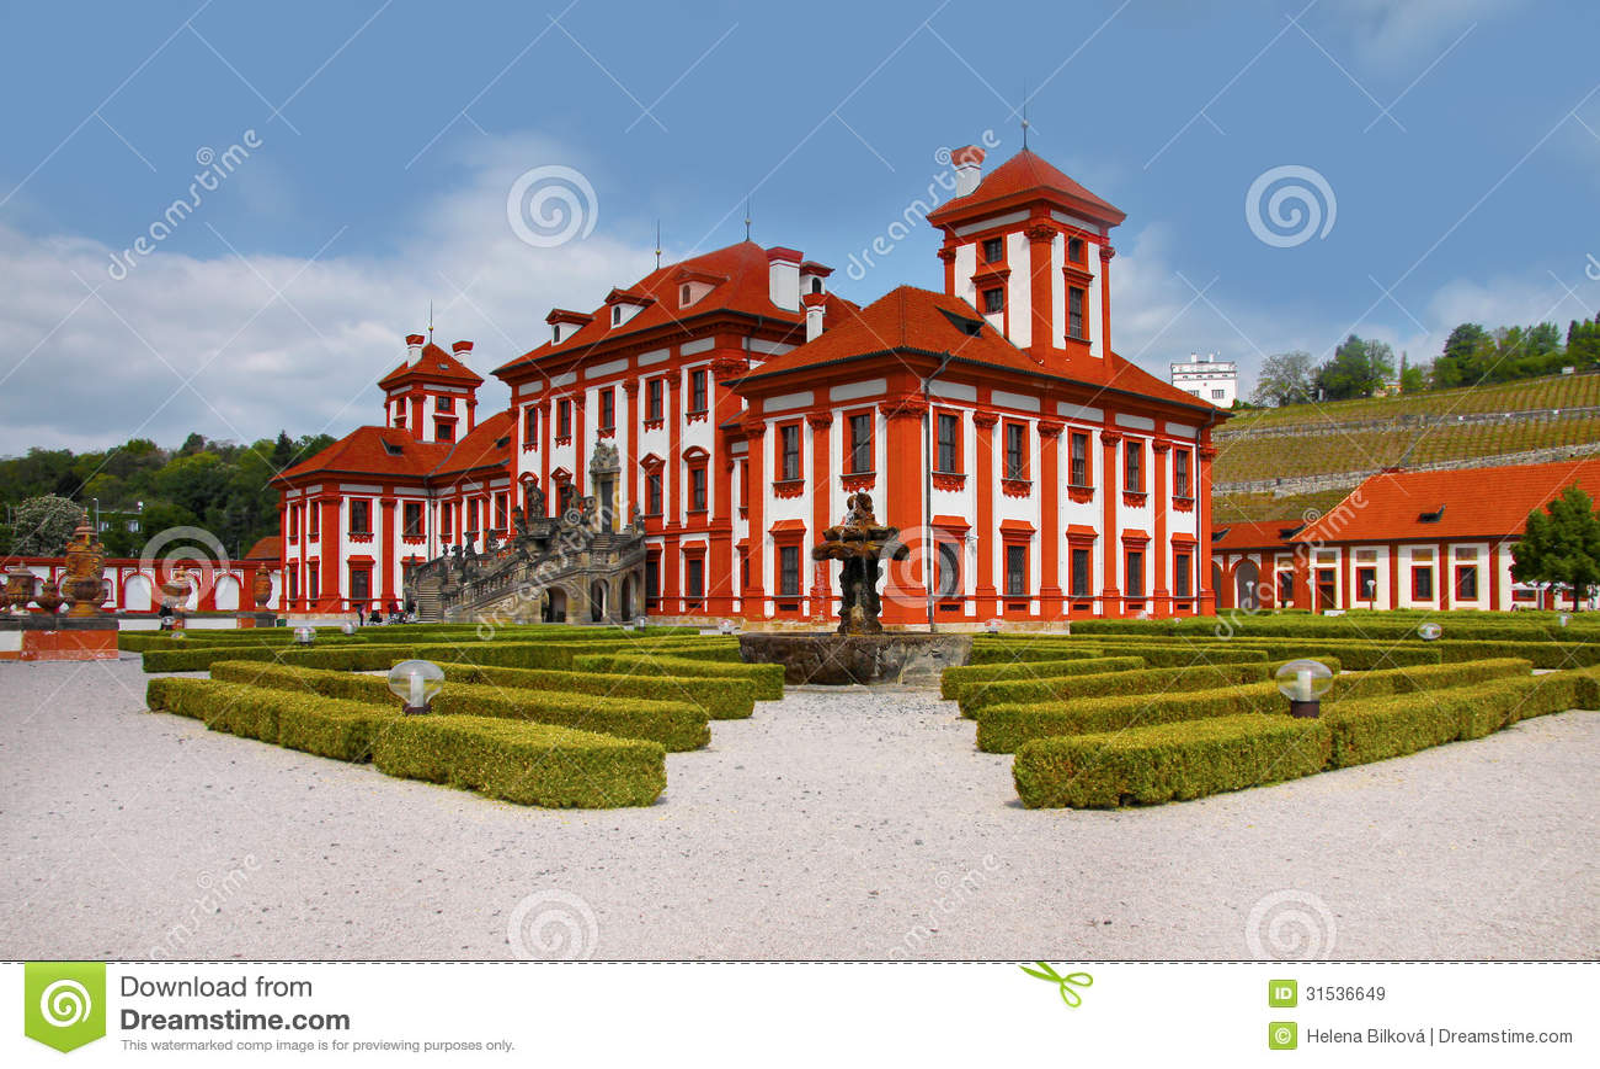 Romantische Troja Chateau - Praag, Oriëntatiepunt